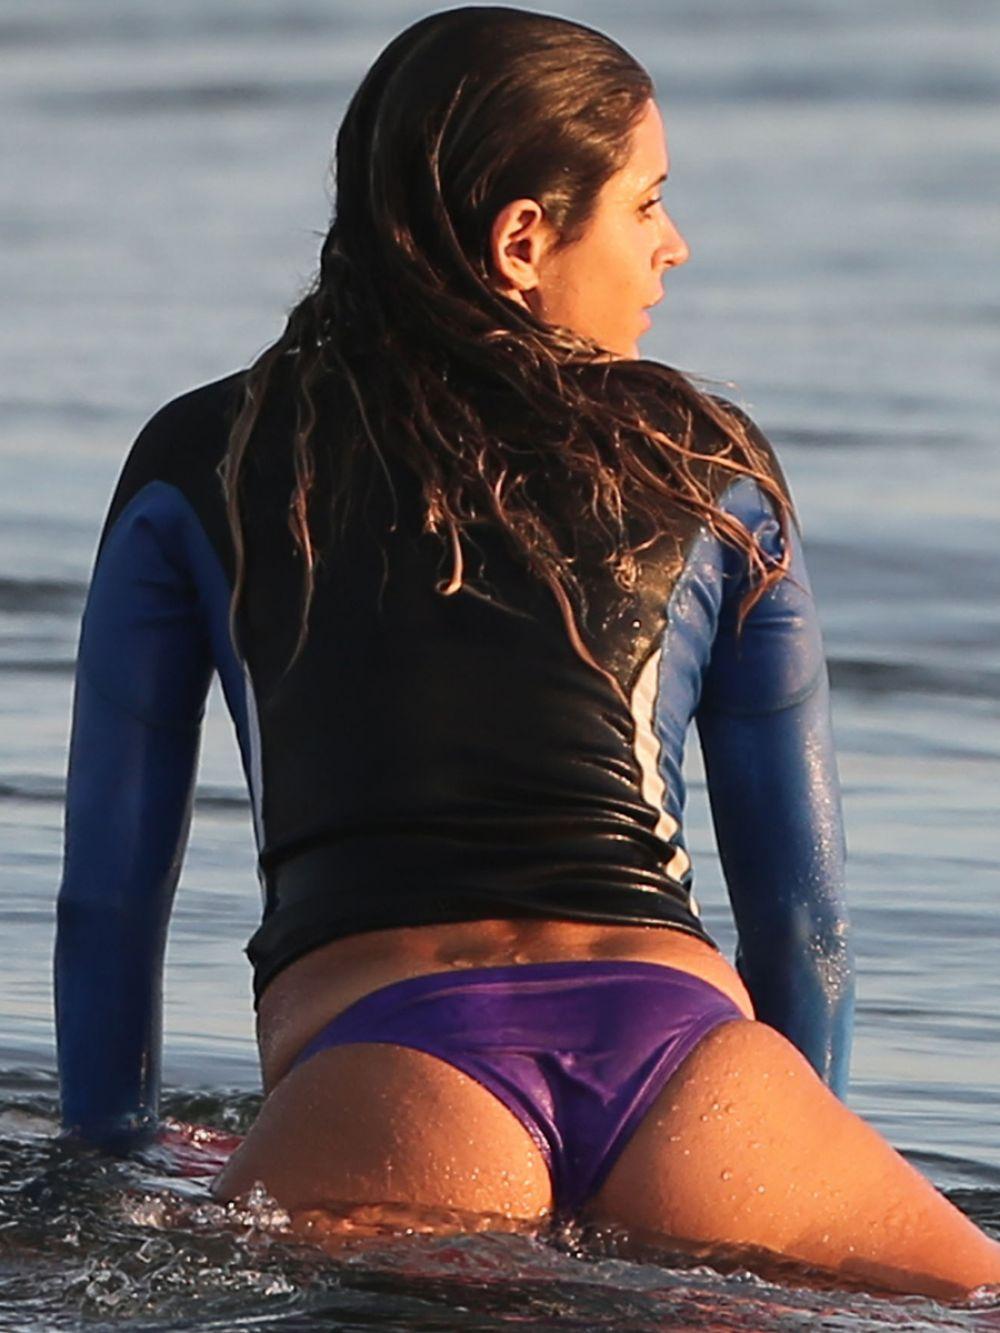 Anastasia Ashley In Bikini Surfing In Los Angeles - Hawtcelebs-6081